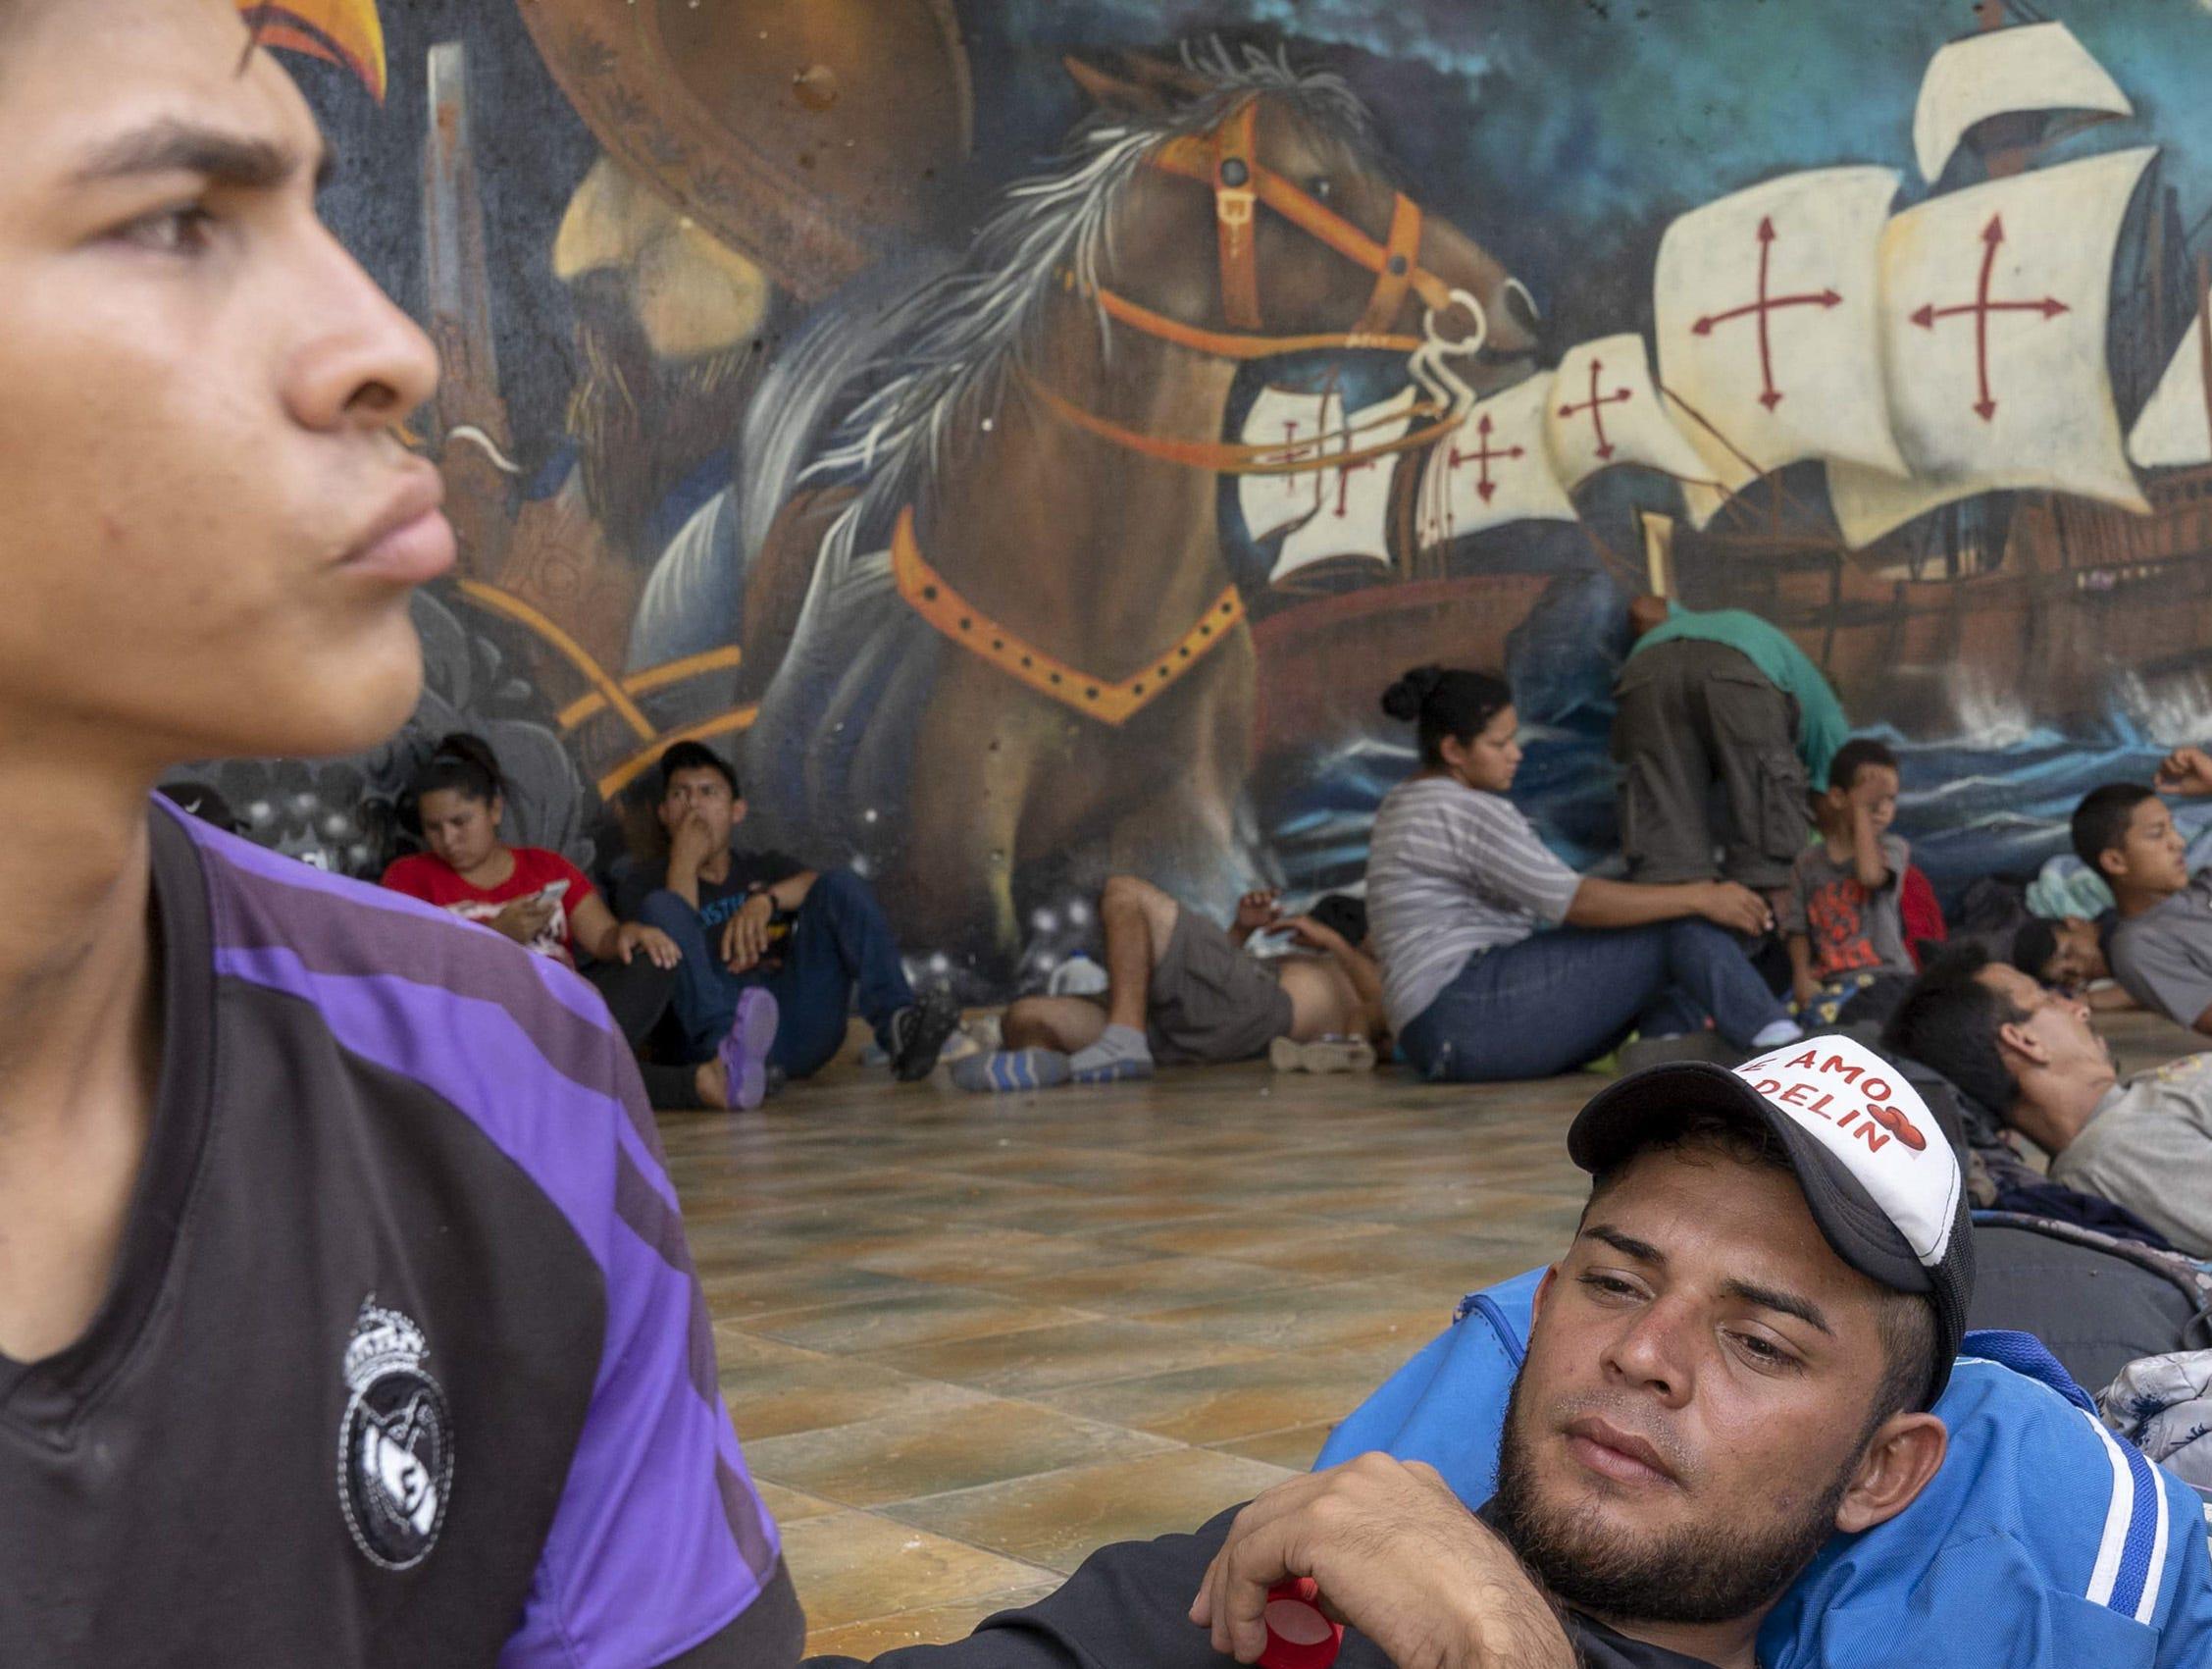 Eduardo Perez, 19, left, and Franklin Eduardo Escobar, 26, from Honduras rest with other migrants near a park in Tecun Uman, Guatemala.